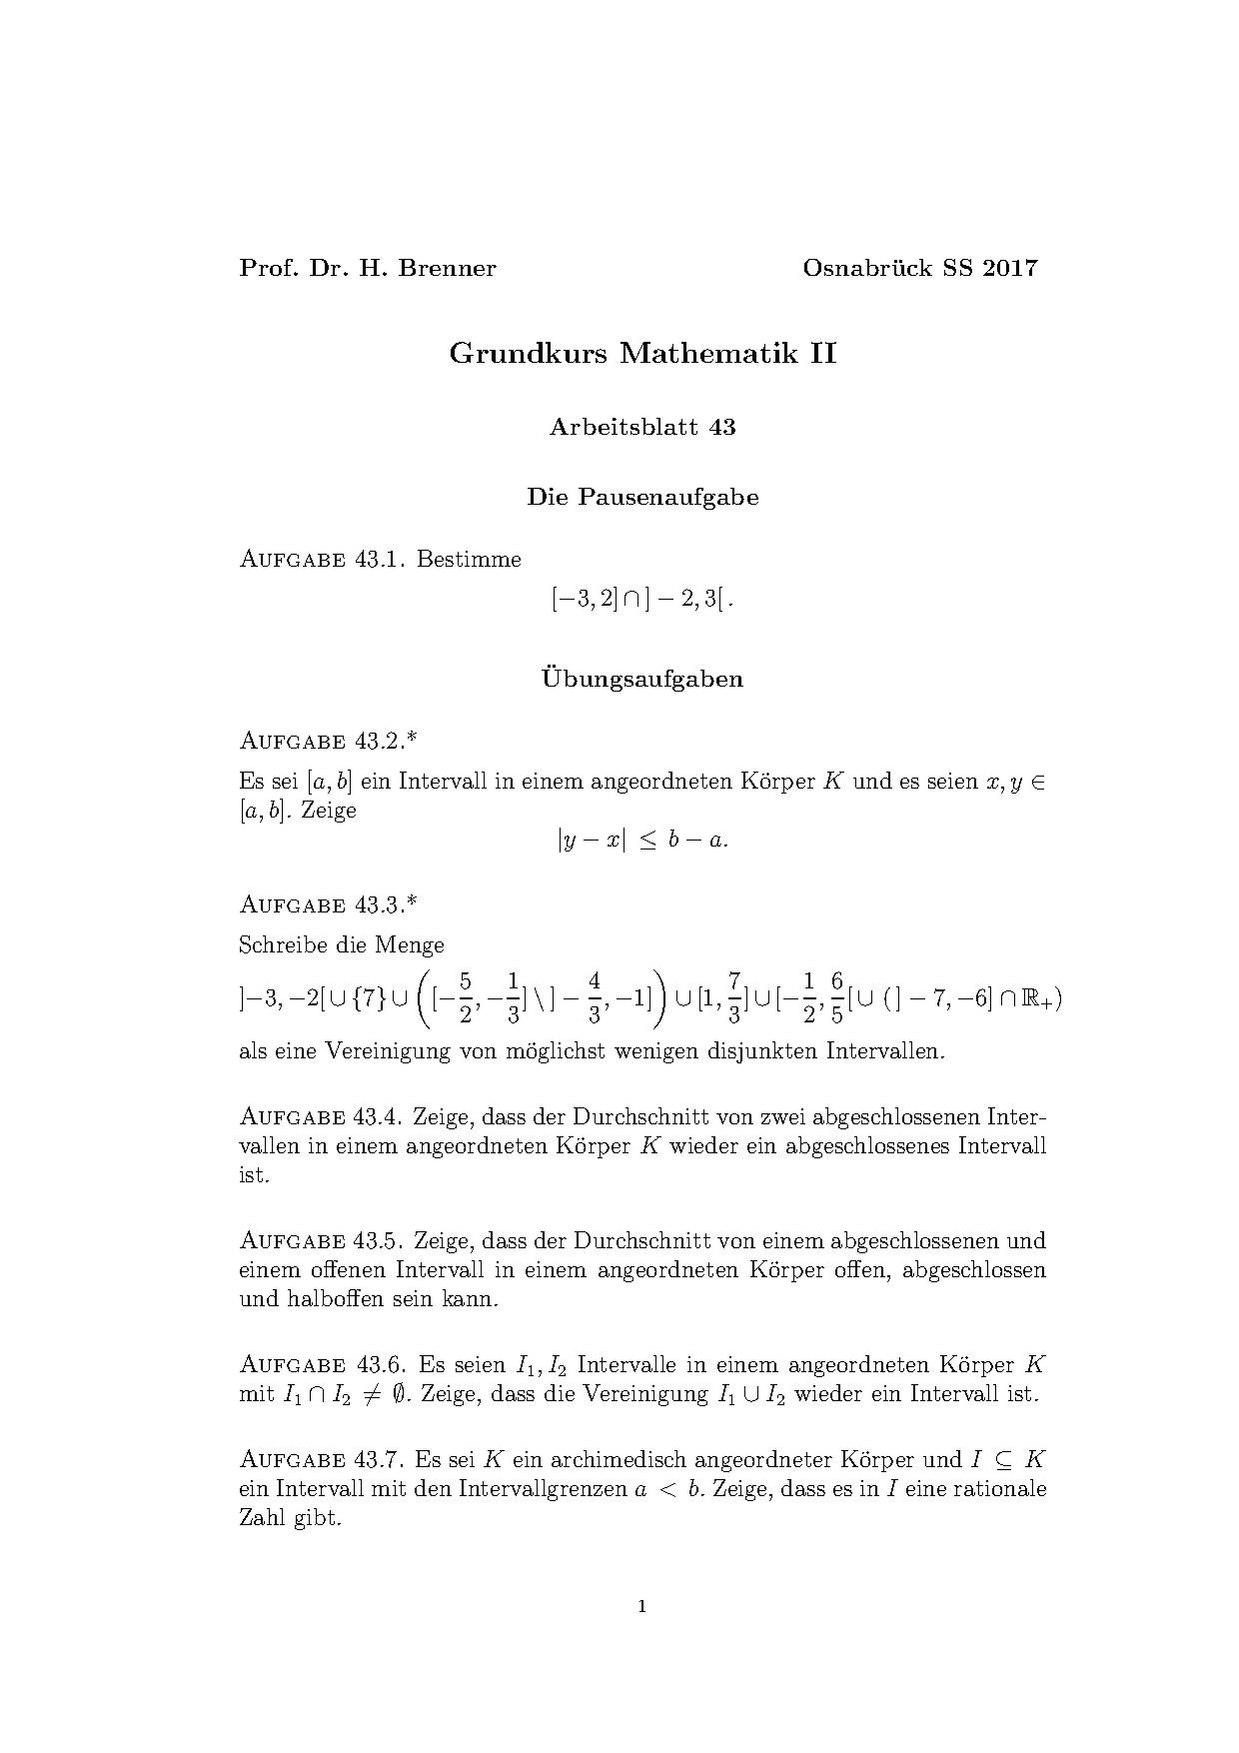 Groß Kalender Mathe Arbeitsblatt Ideen - Mathe Arbeitsblatt ...